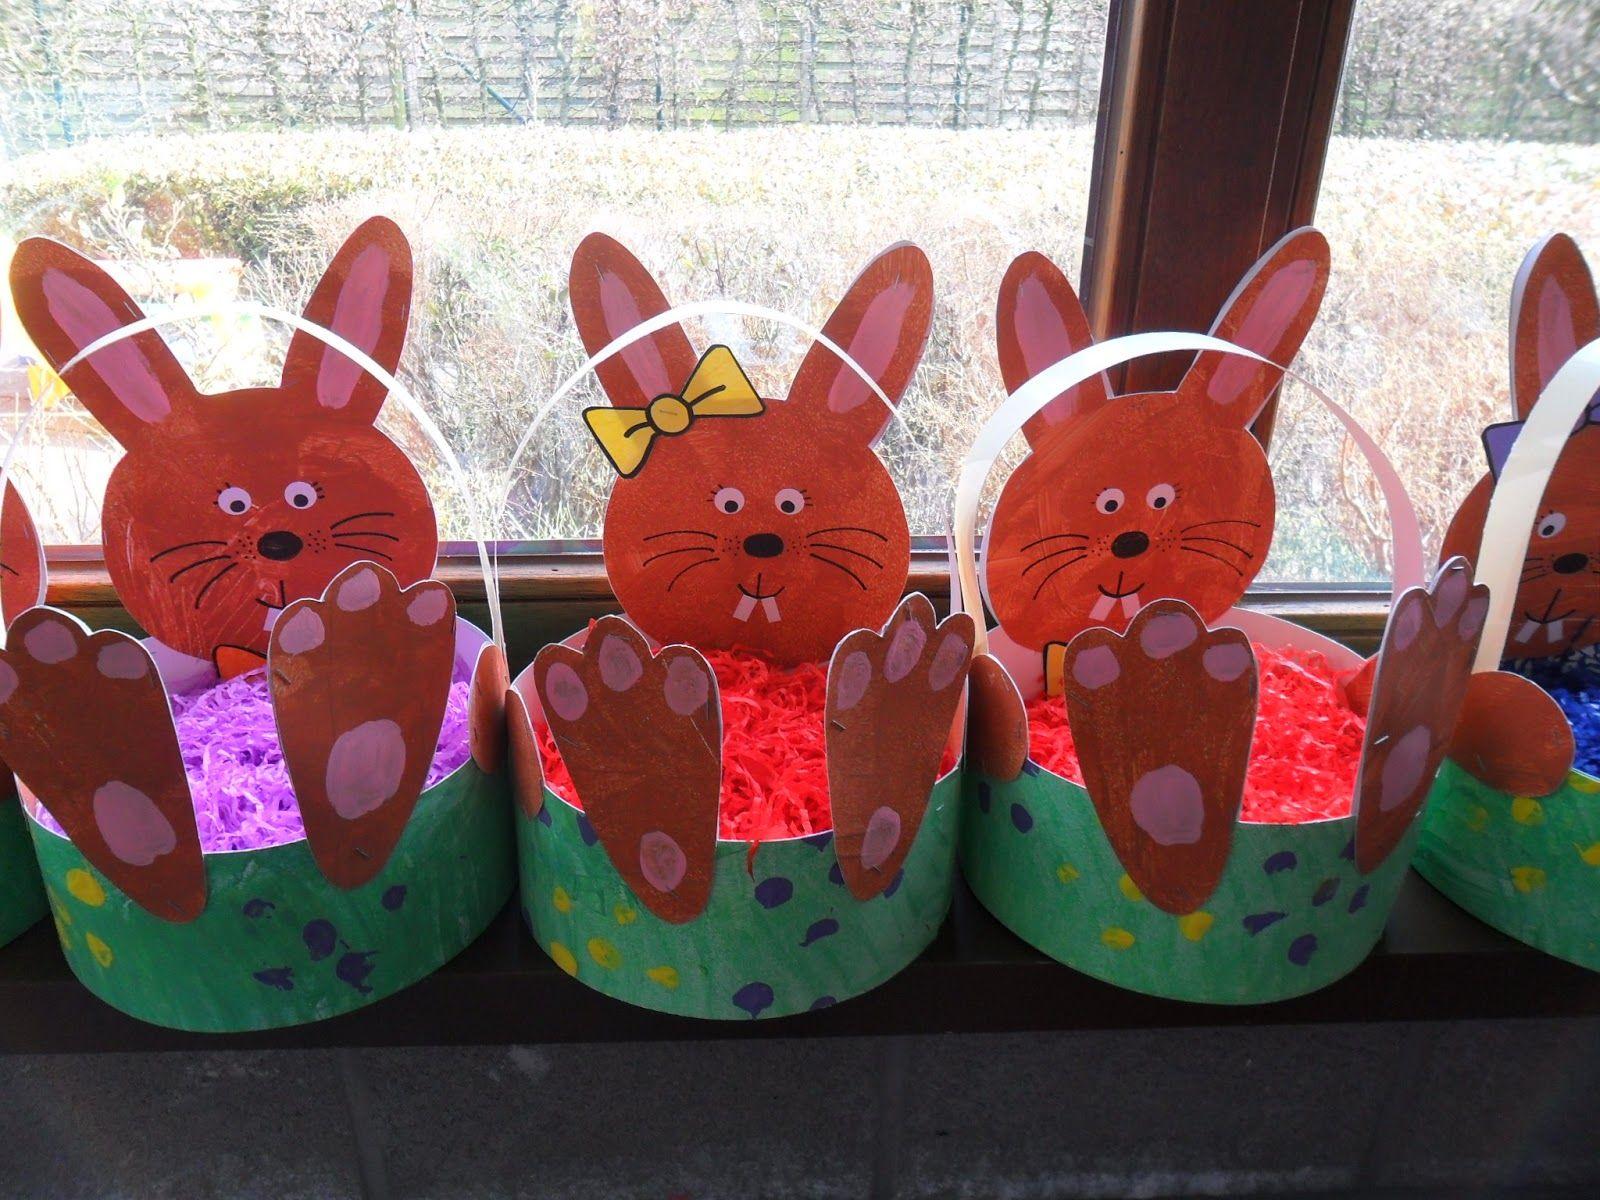 Pibterest Cast Ideas For Kids: Pasen - Pasen, Knutselen Voor Pasen En